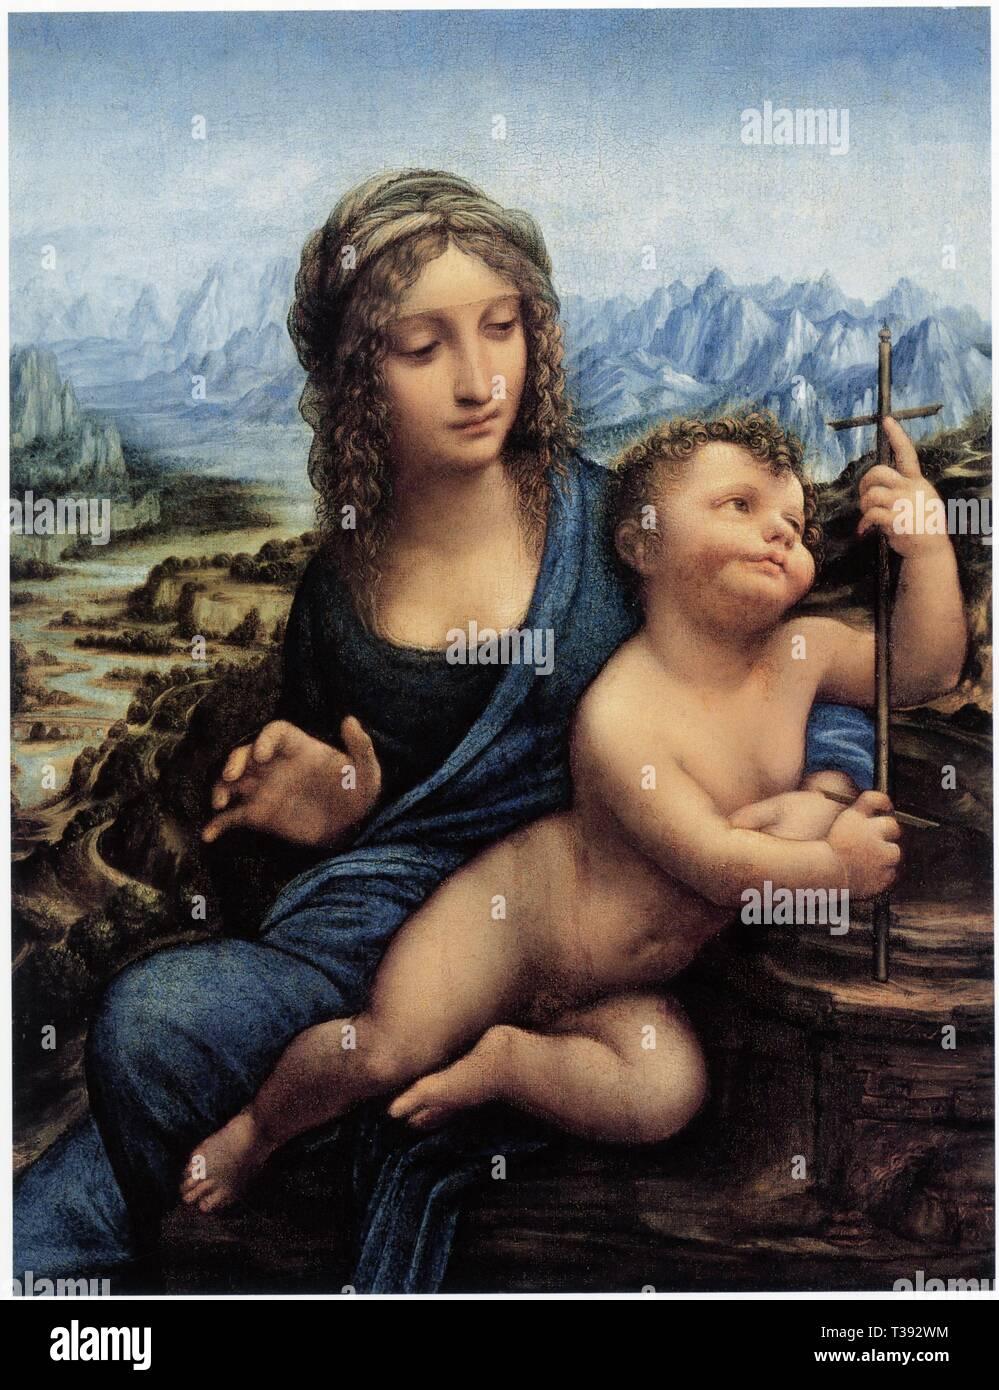 LEONARDO DA VINCI.MADONNA OF YARNWINDER.1501.OIL ON WOOD.52.2 CM X 36.4 CM - Stock Image